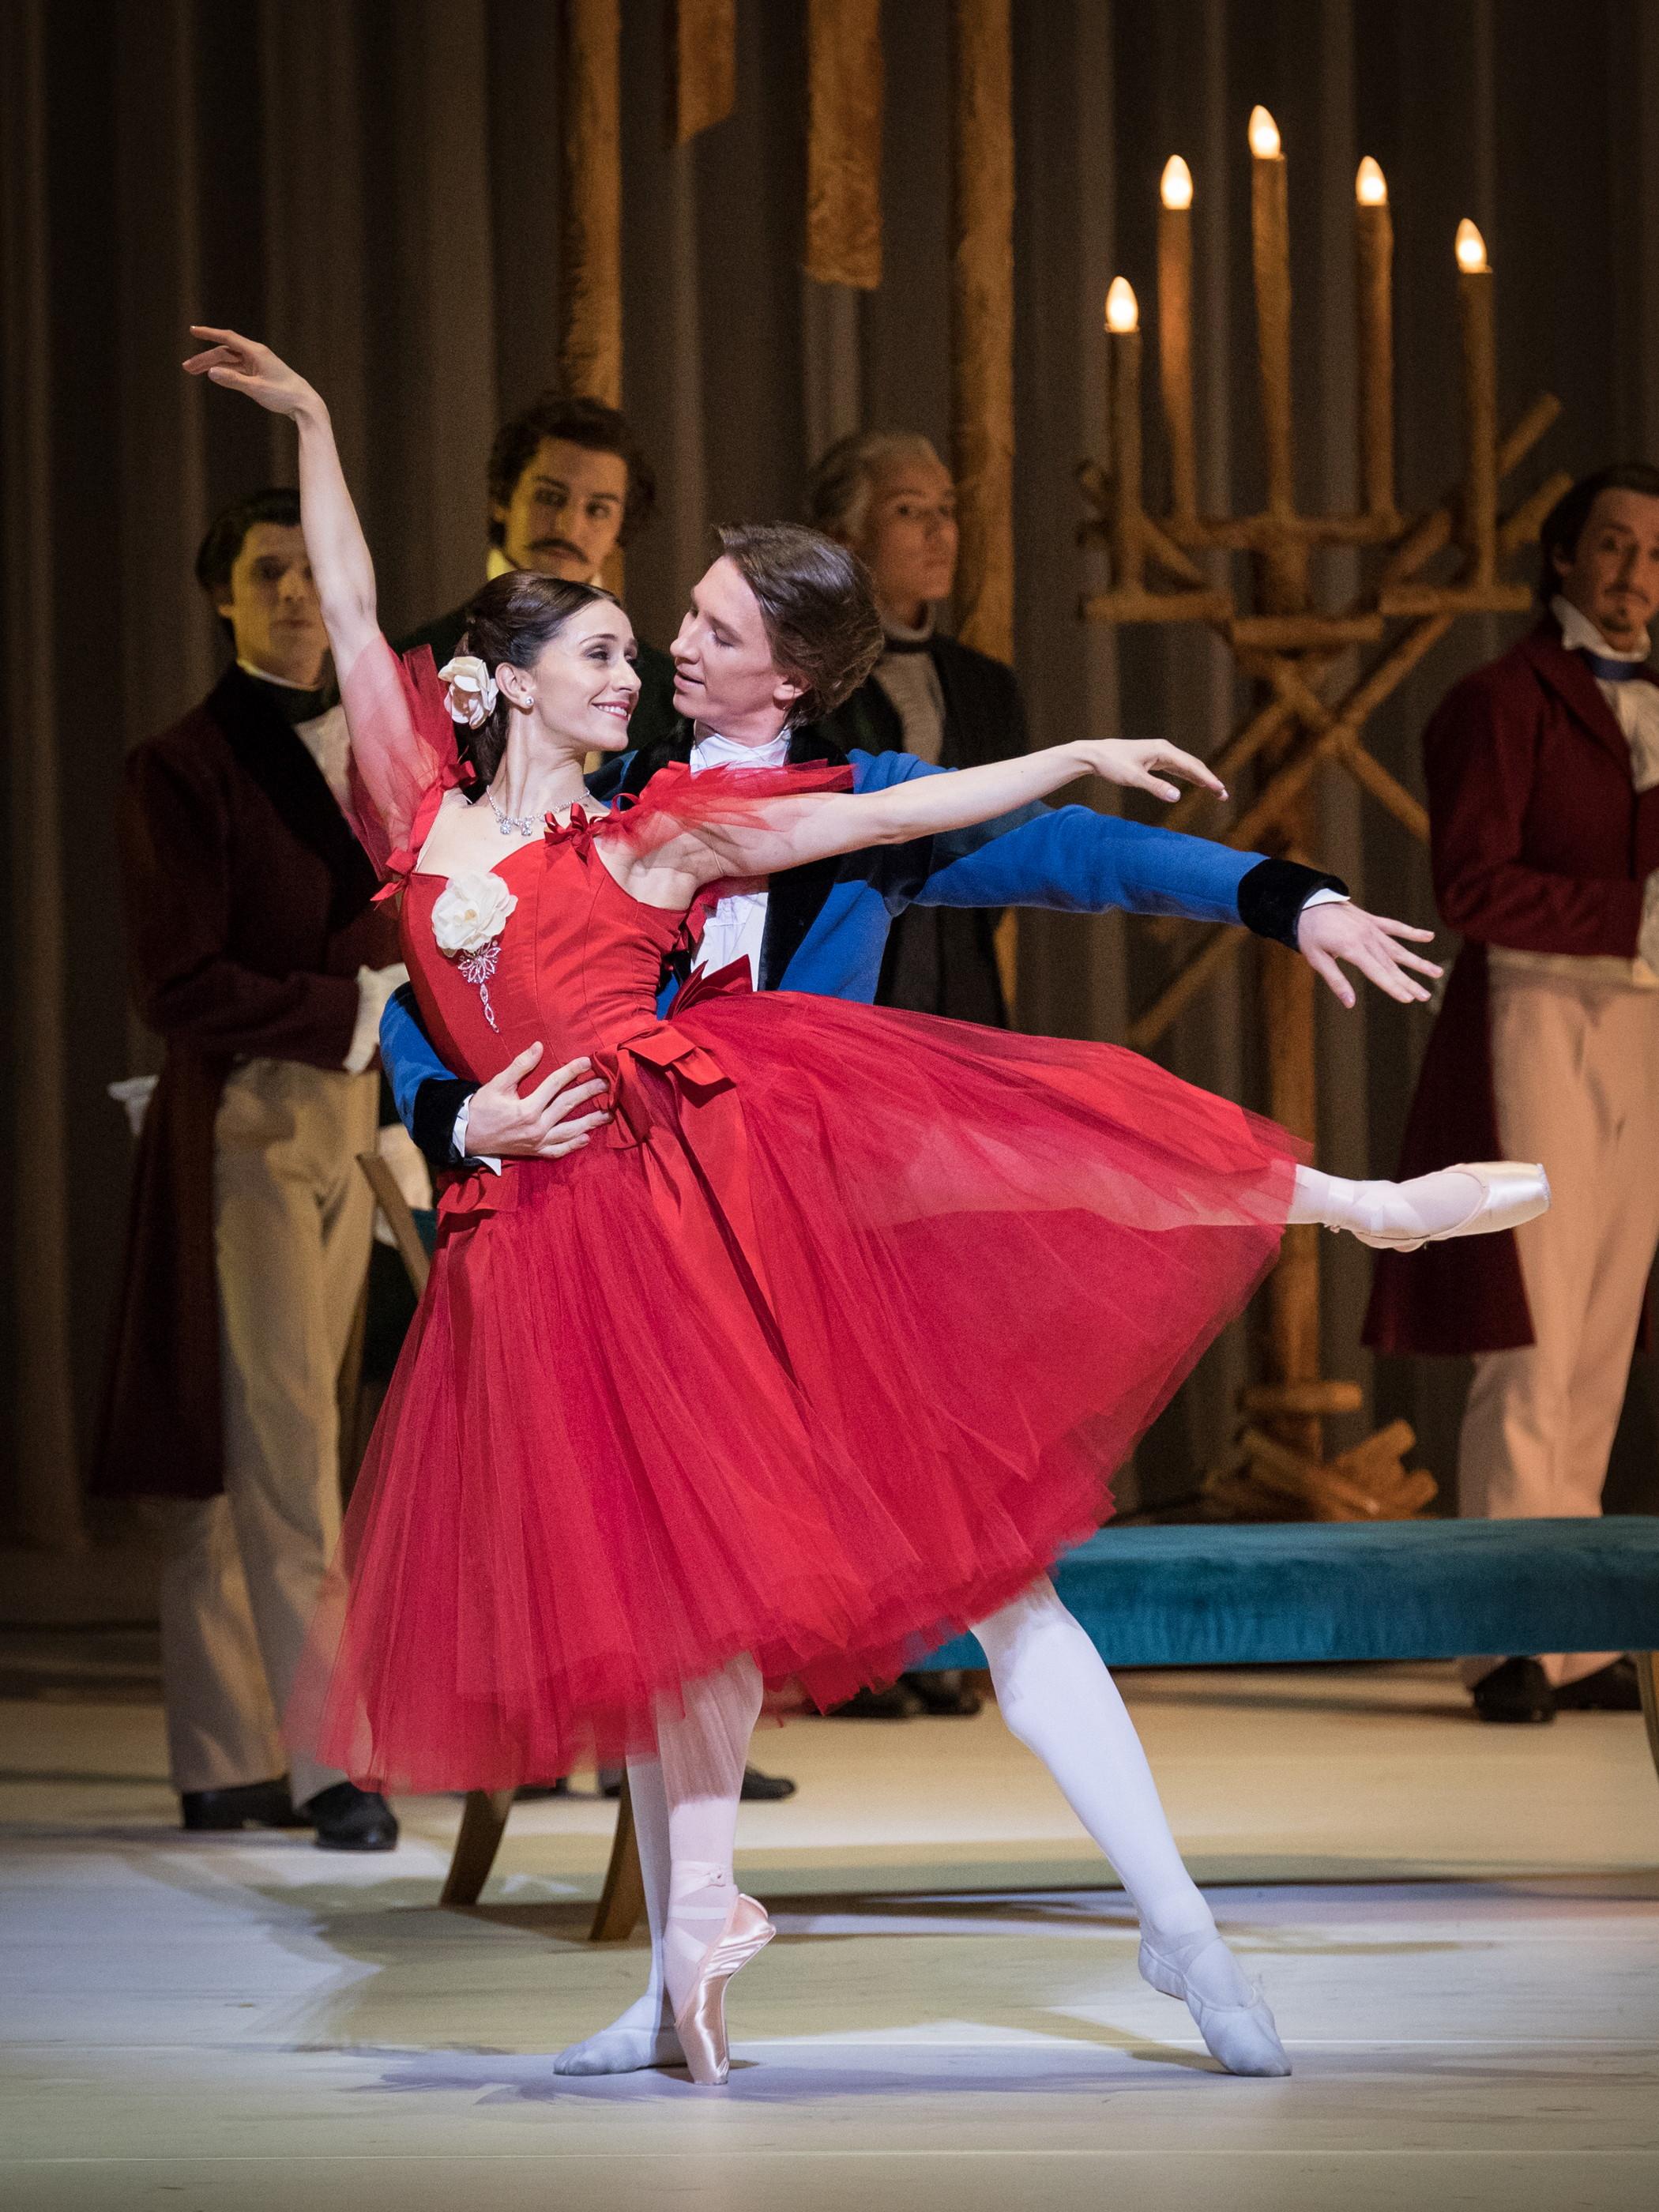 Marianela Nuñez and Vadim Muntagirov. Copyright: Vienna State Ballet/Ashley taylor